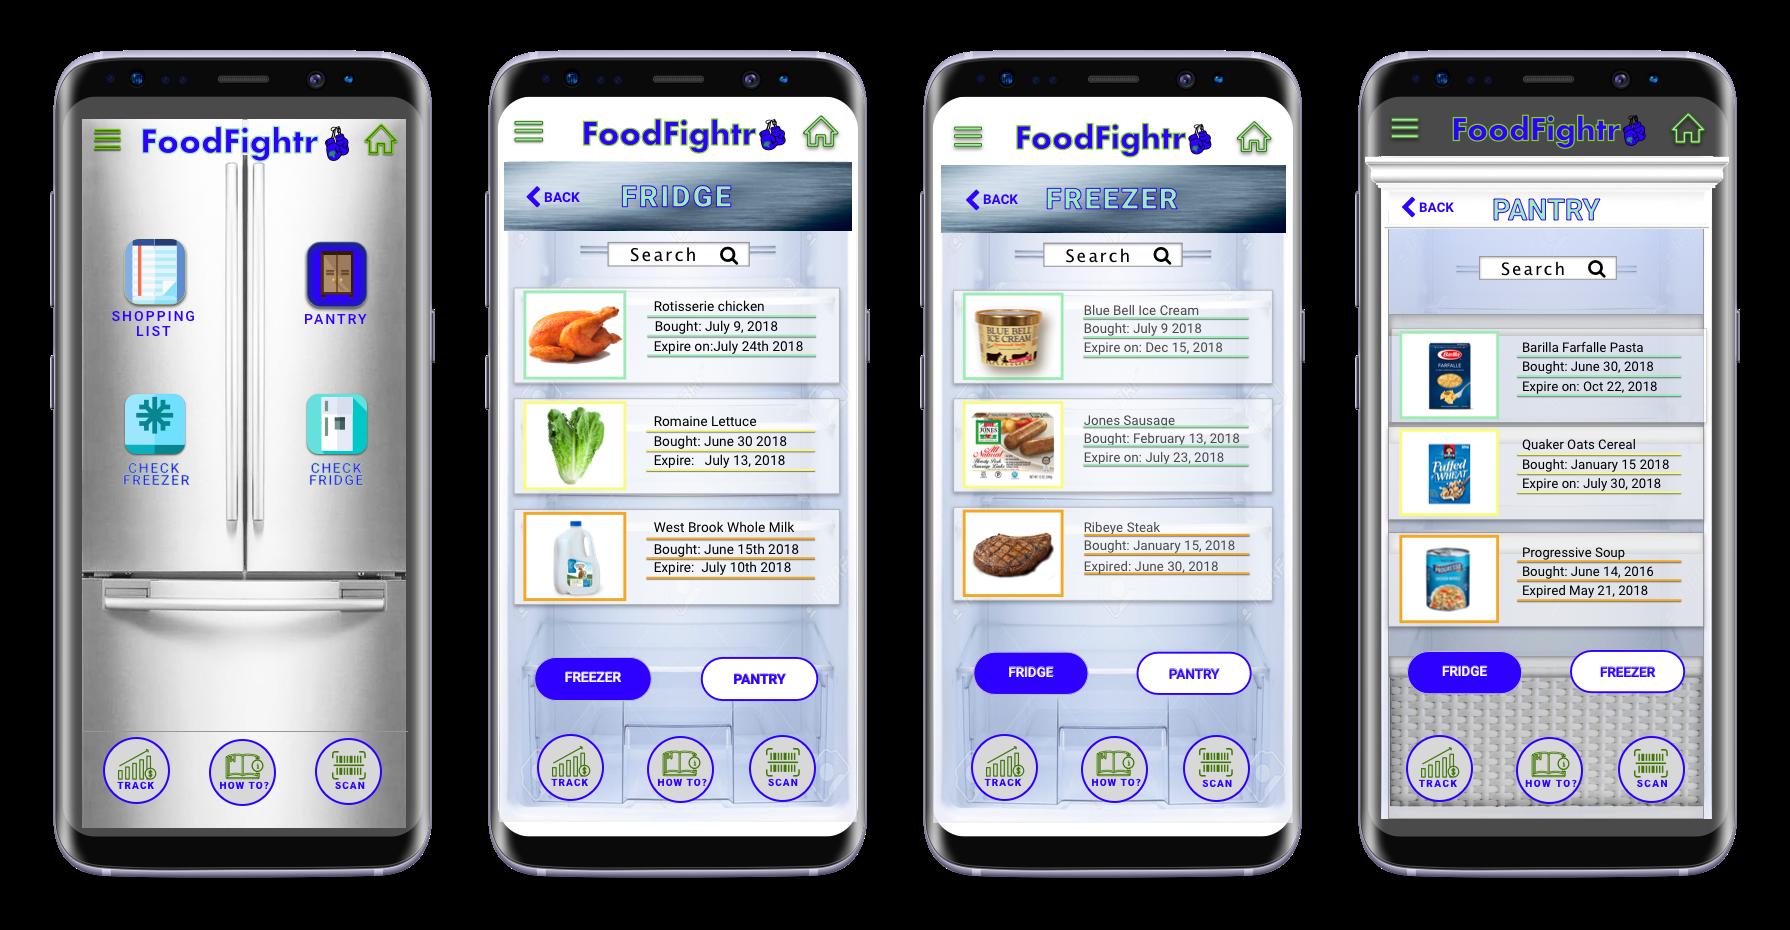 FoodFighter Hi-Fi Artboard 1.png